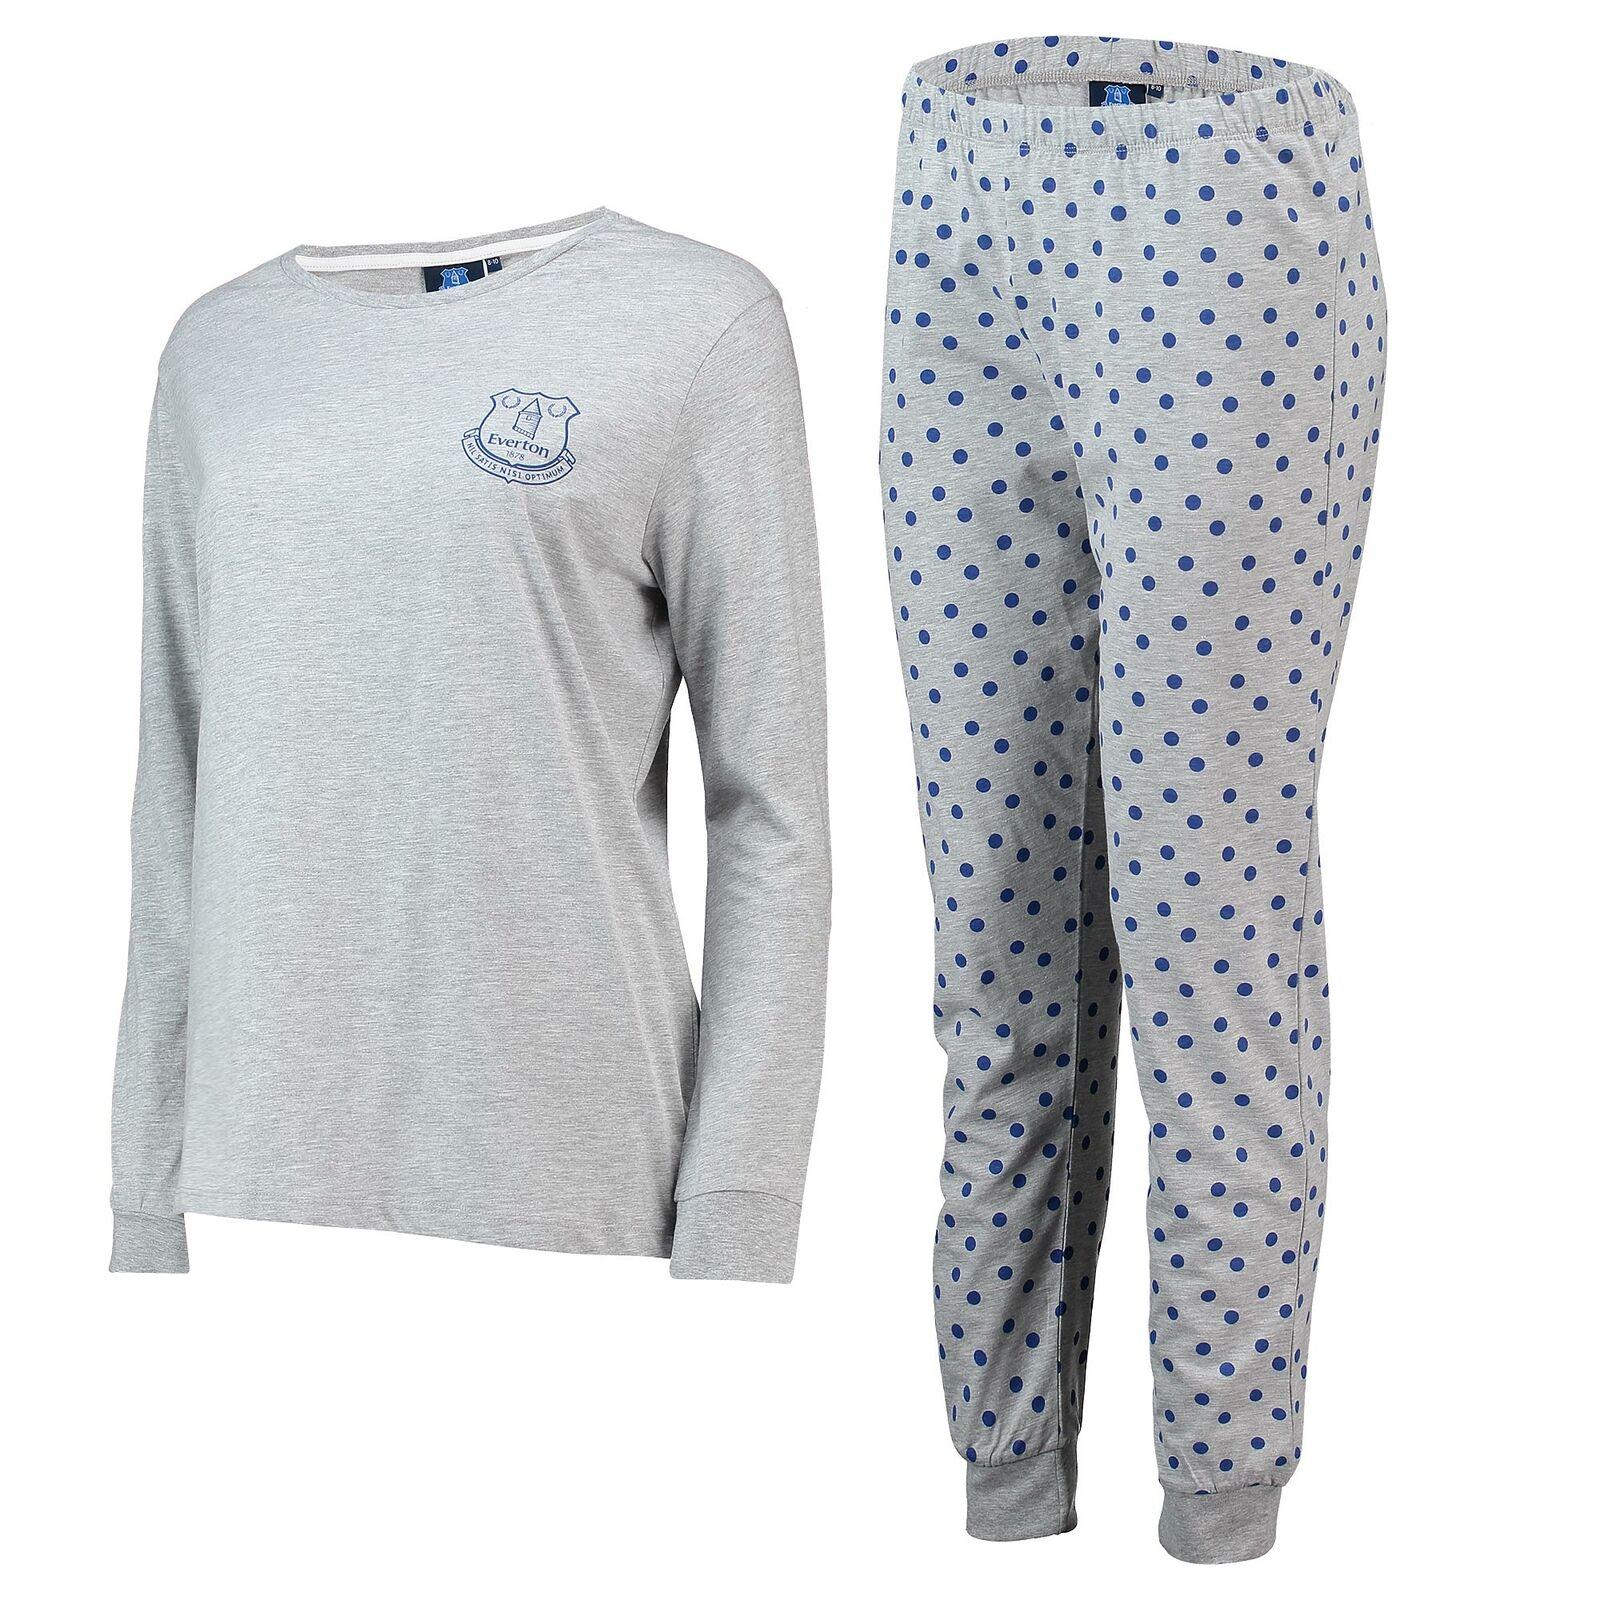 Egreenon Sweat and Jogger Lounge Set PJ Nightwear Football Grey Marl Womens